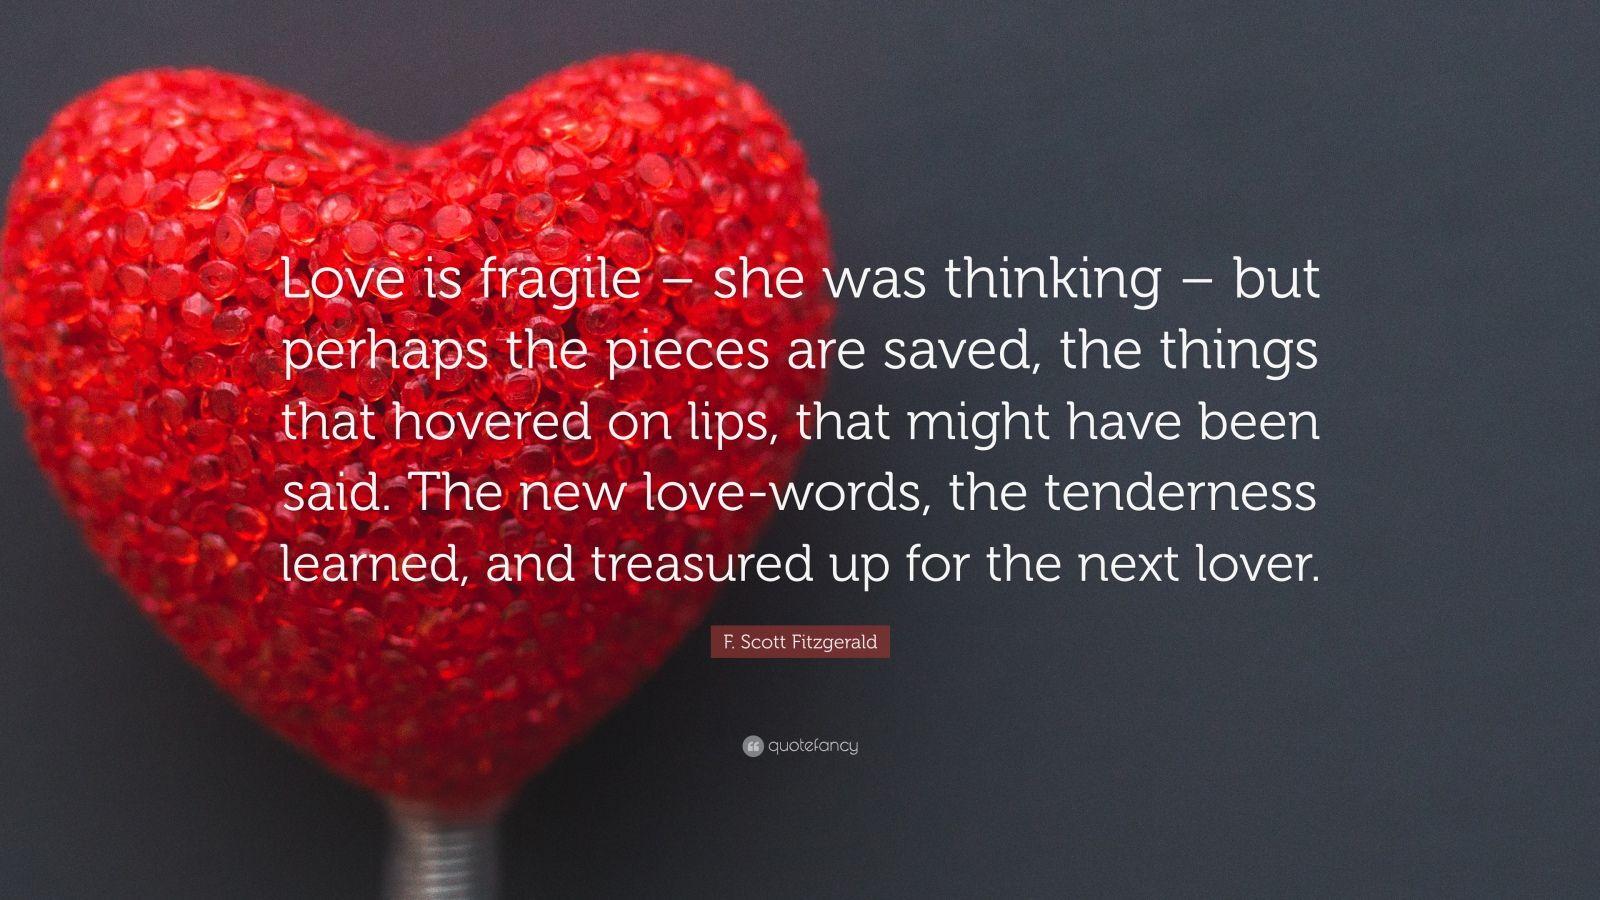 F scott fitzgerald quotes 100 wallpapers quotefancy f scott fitzgerald quote love is fragile she was thinking but altavistaventures Choice Image